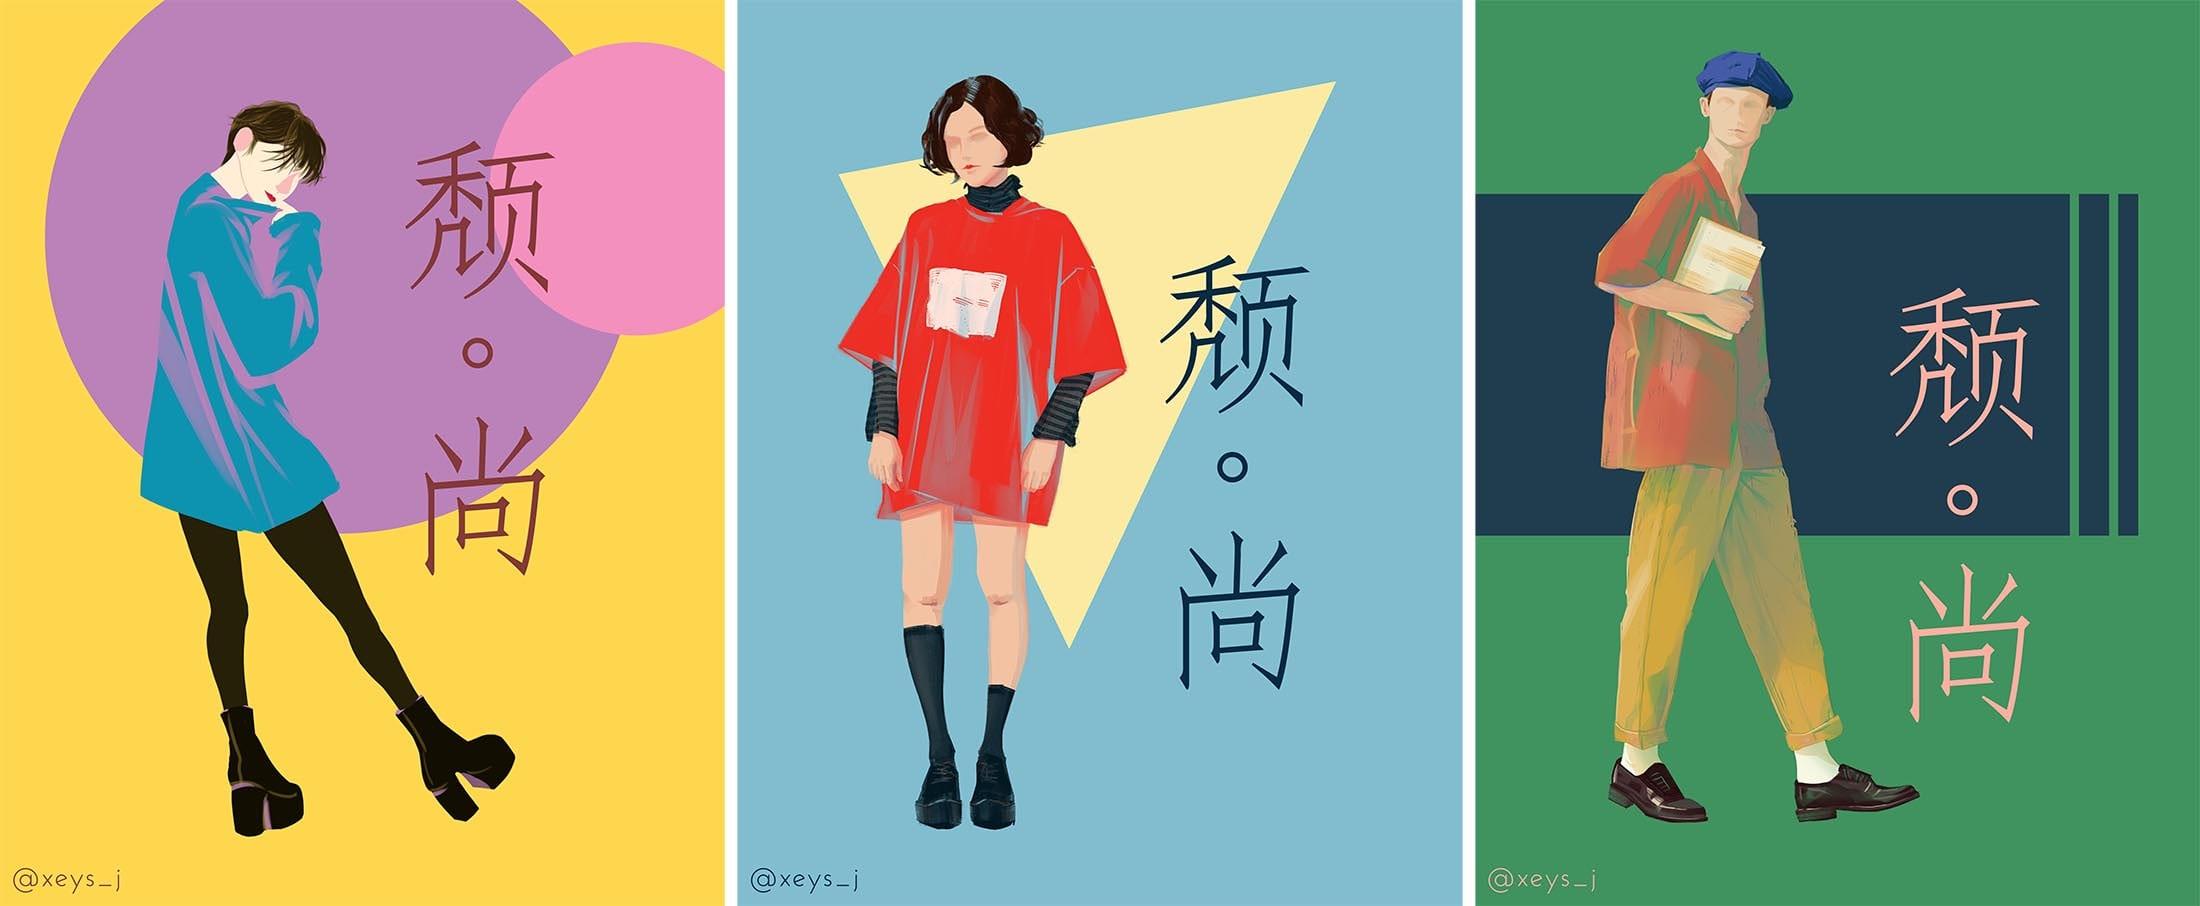 lazy fashion doodle illustration series